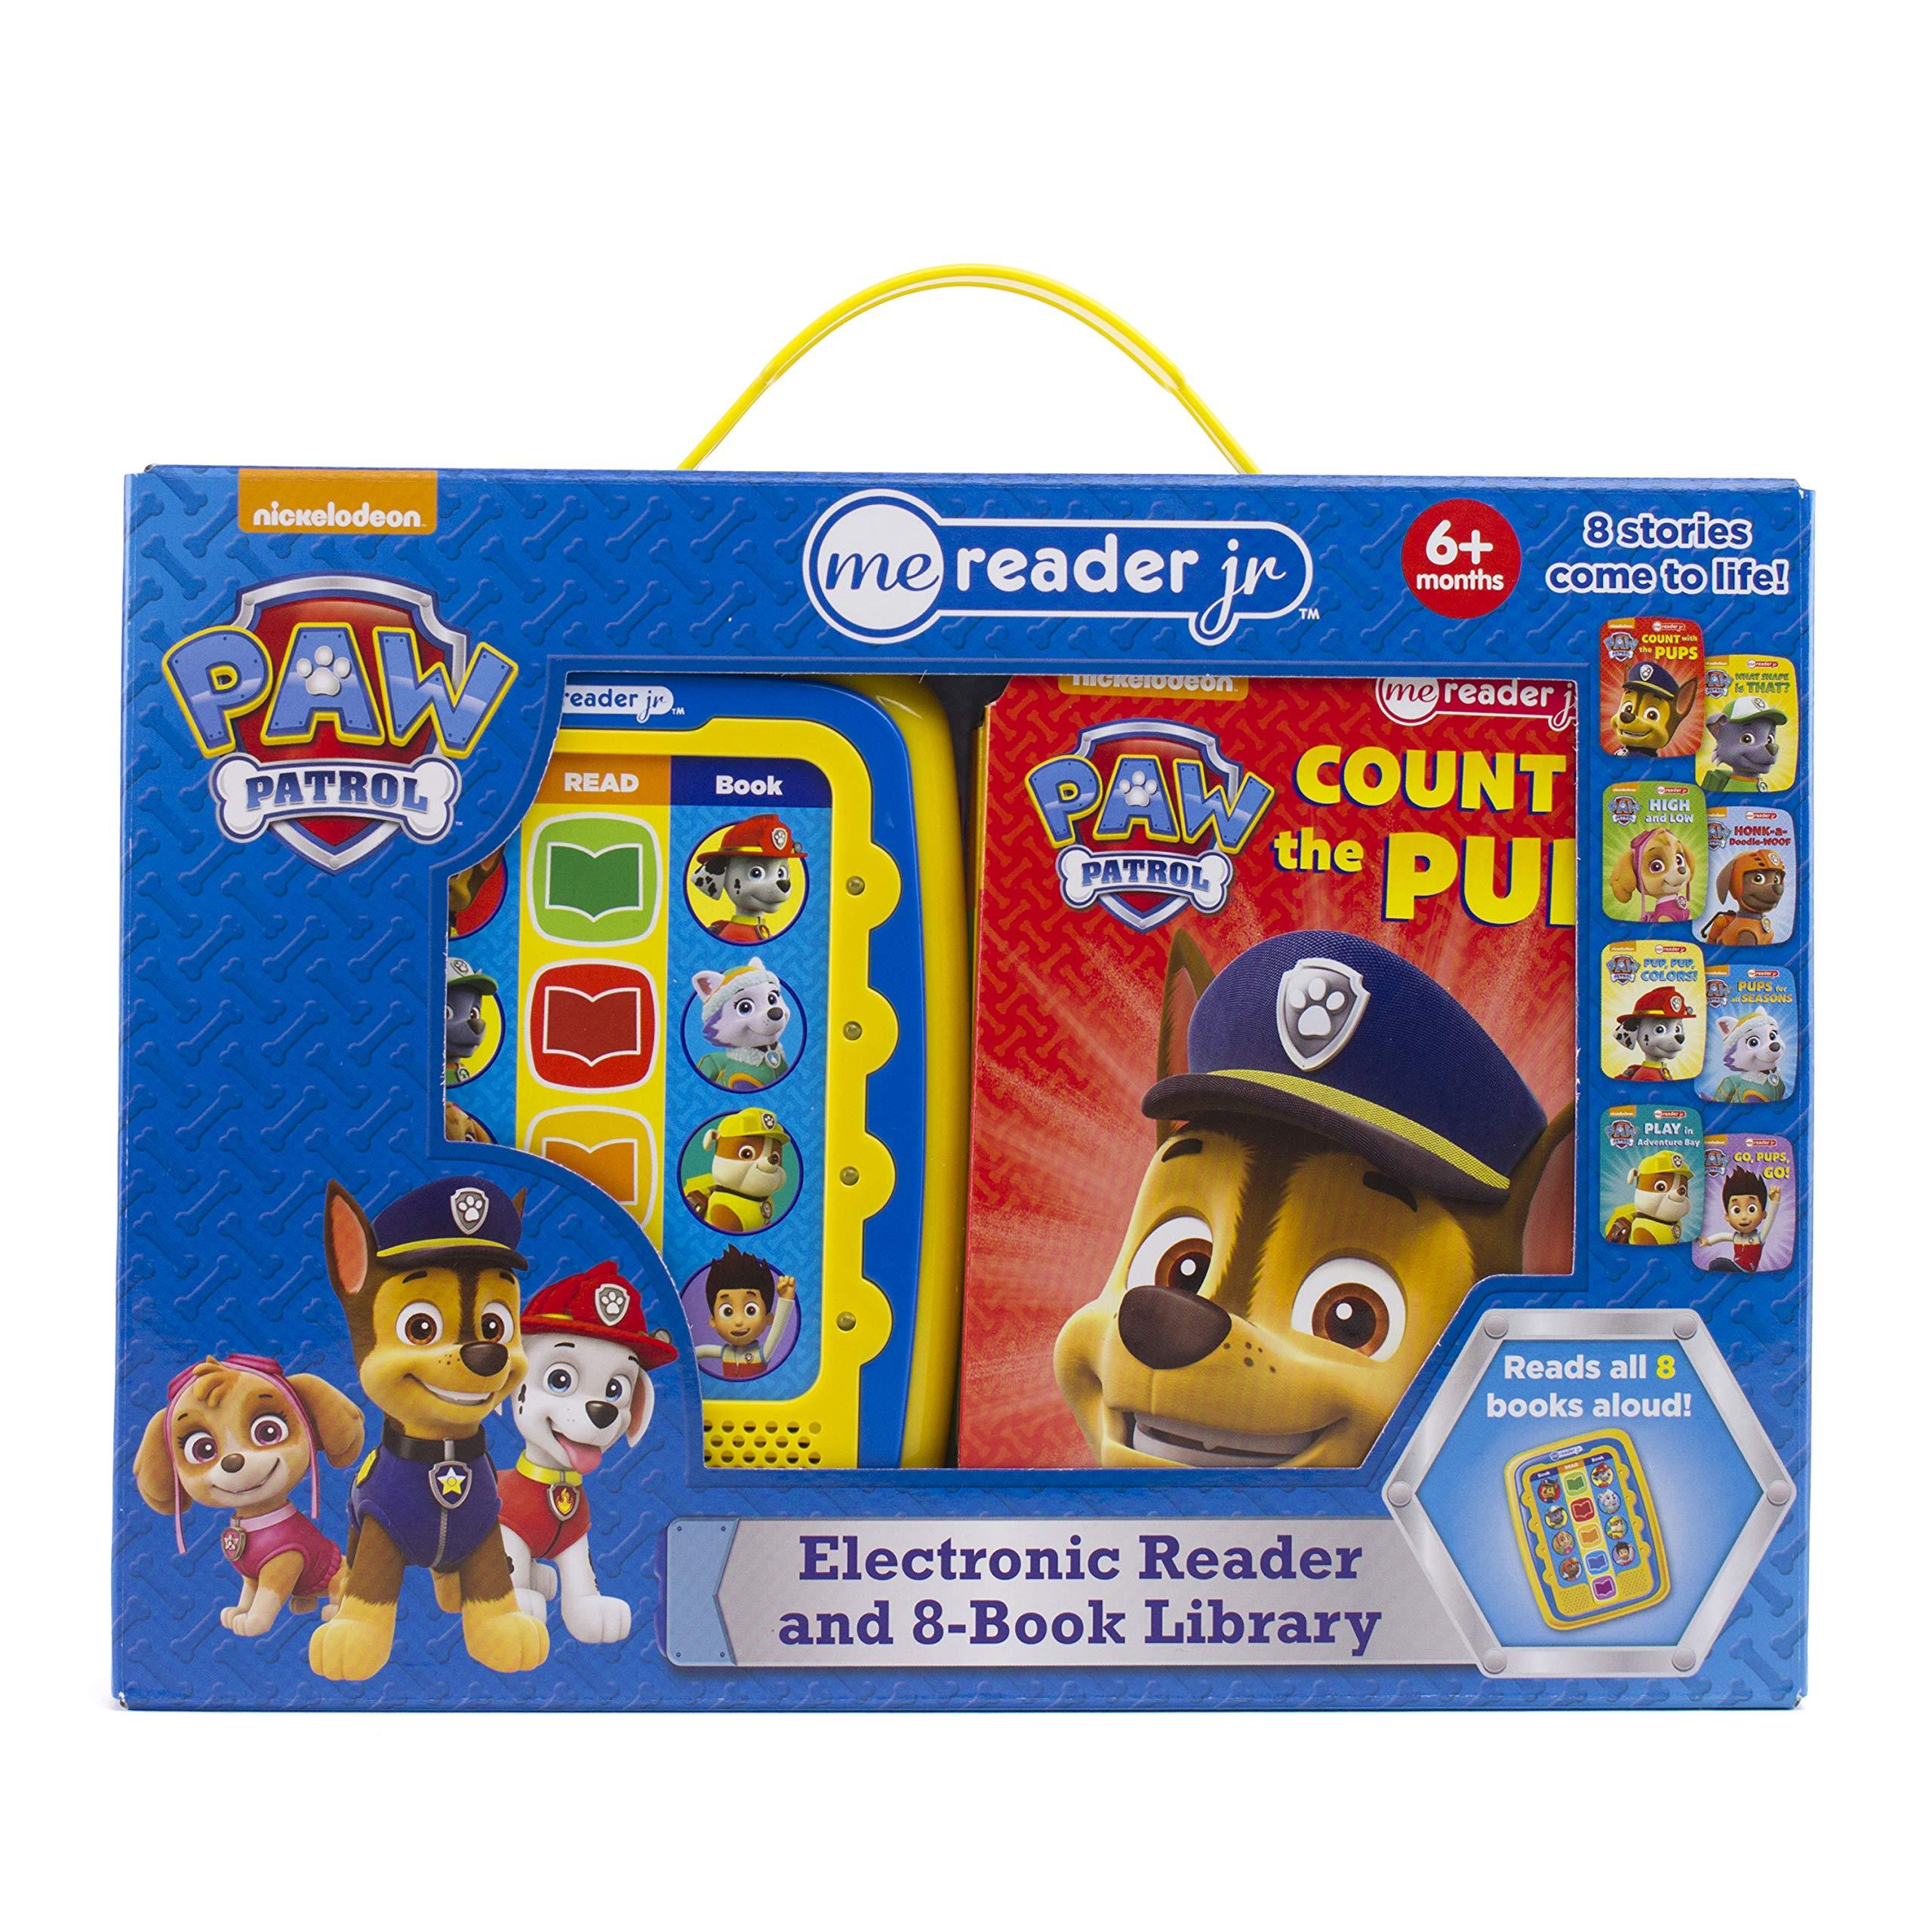 Nickelodeon - PAW Patrol Me Reader Jr. 8-Book Library - PI Kids